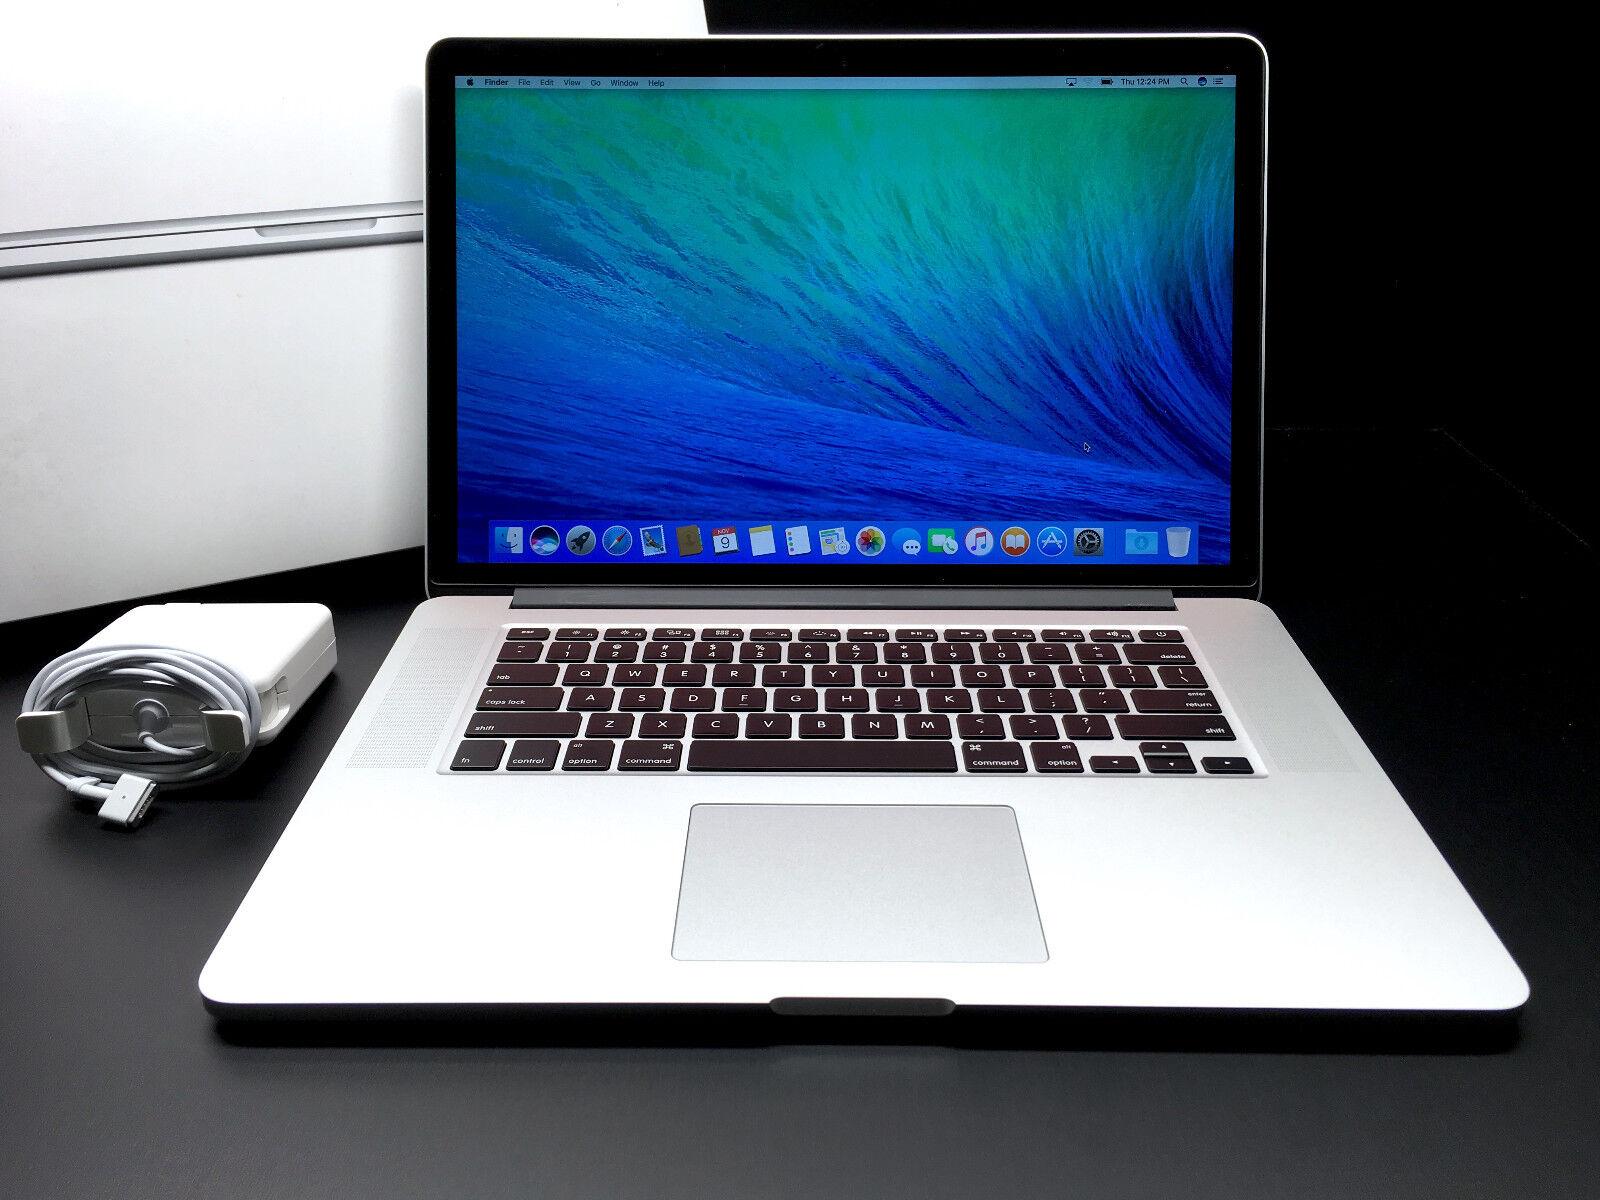 "Macbook Pro - Apple Macbook Pro 15"" Retina / Core i7 2.6Ghz / HUGE 512GB SSD / 3 Year Warranty"